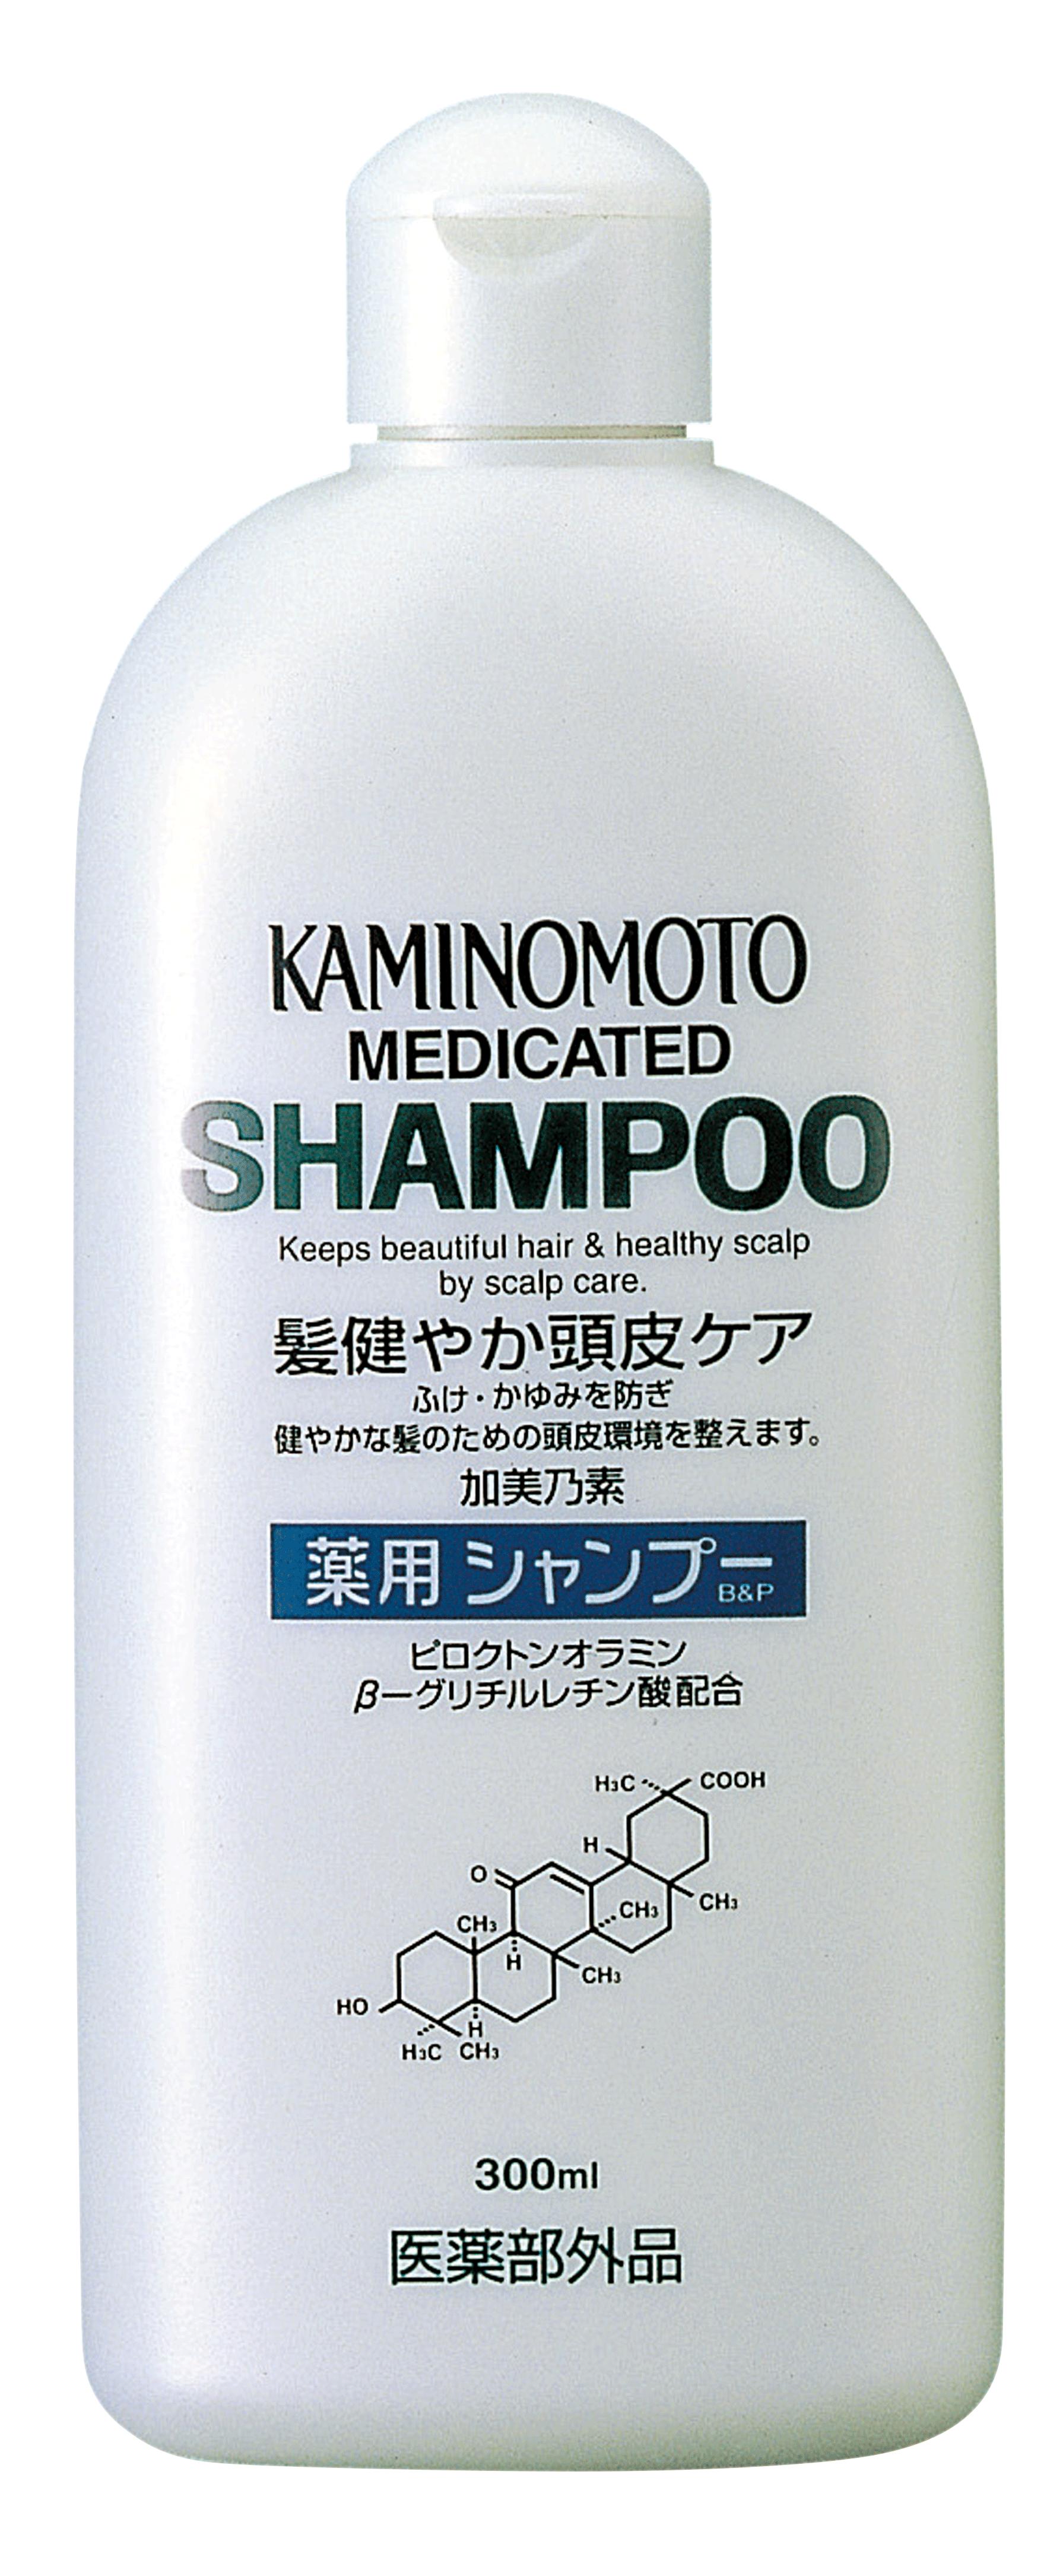 Kaminomoto Medicated Shampoo B Amp P|hair Care Products|kaminomoto